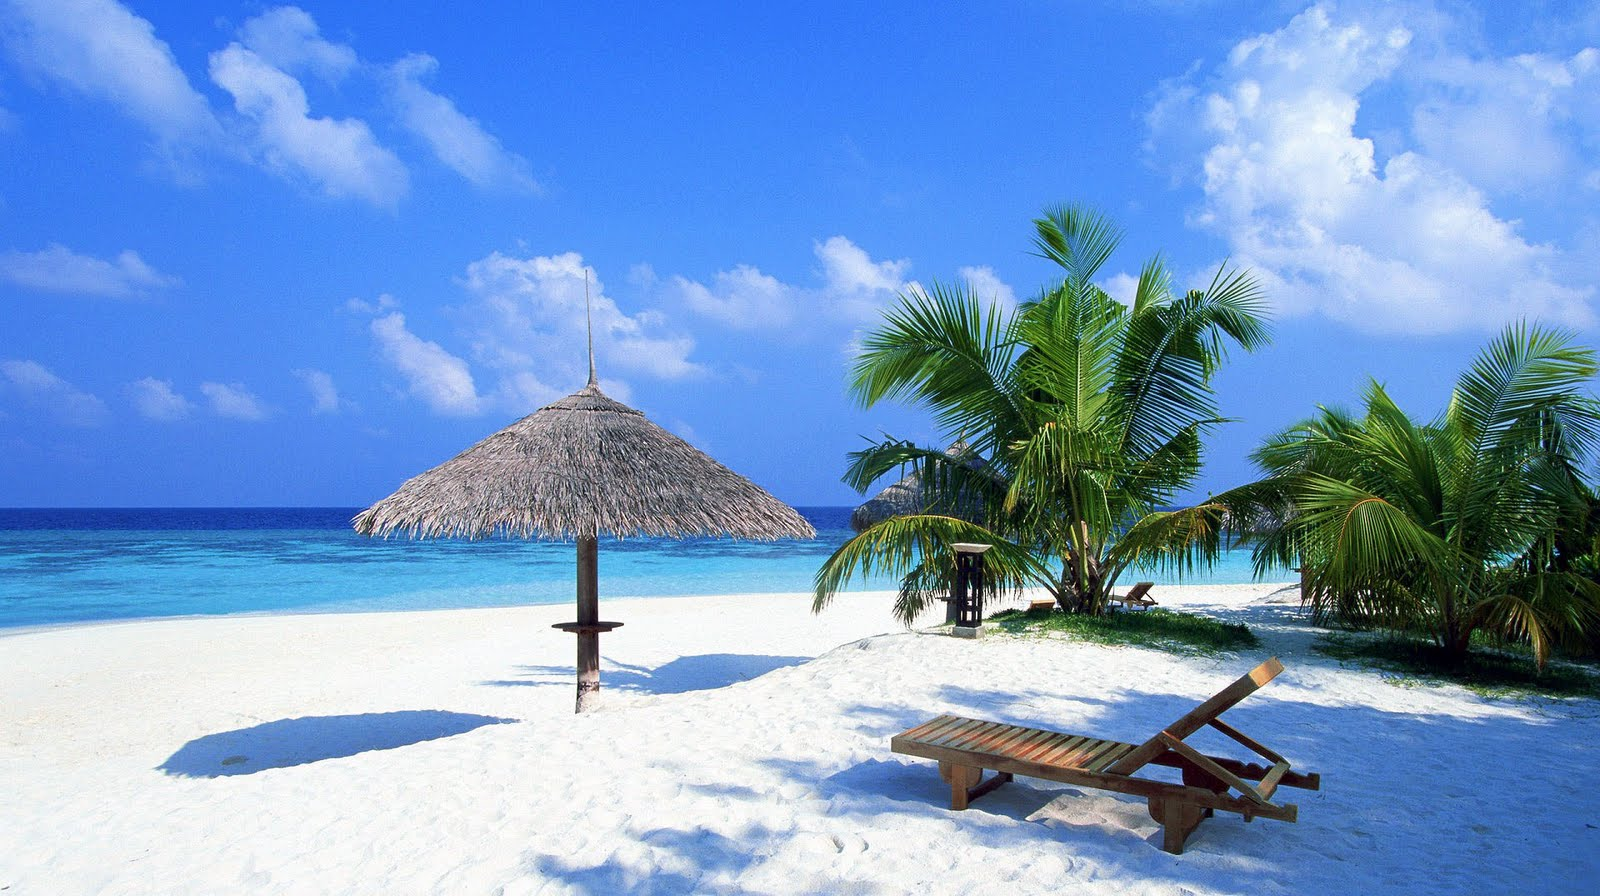 tropical beach Dominican Republic Wallpapers HD 1600x896